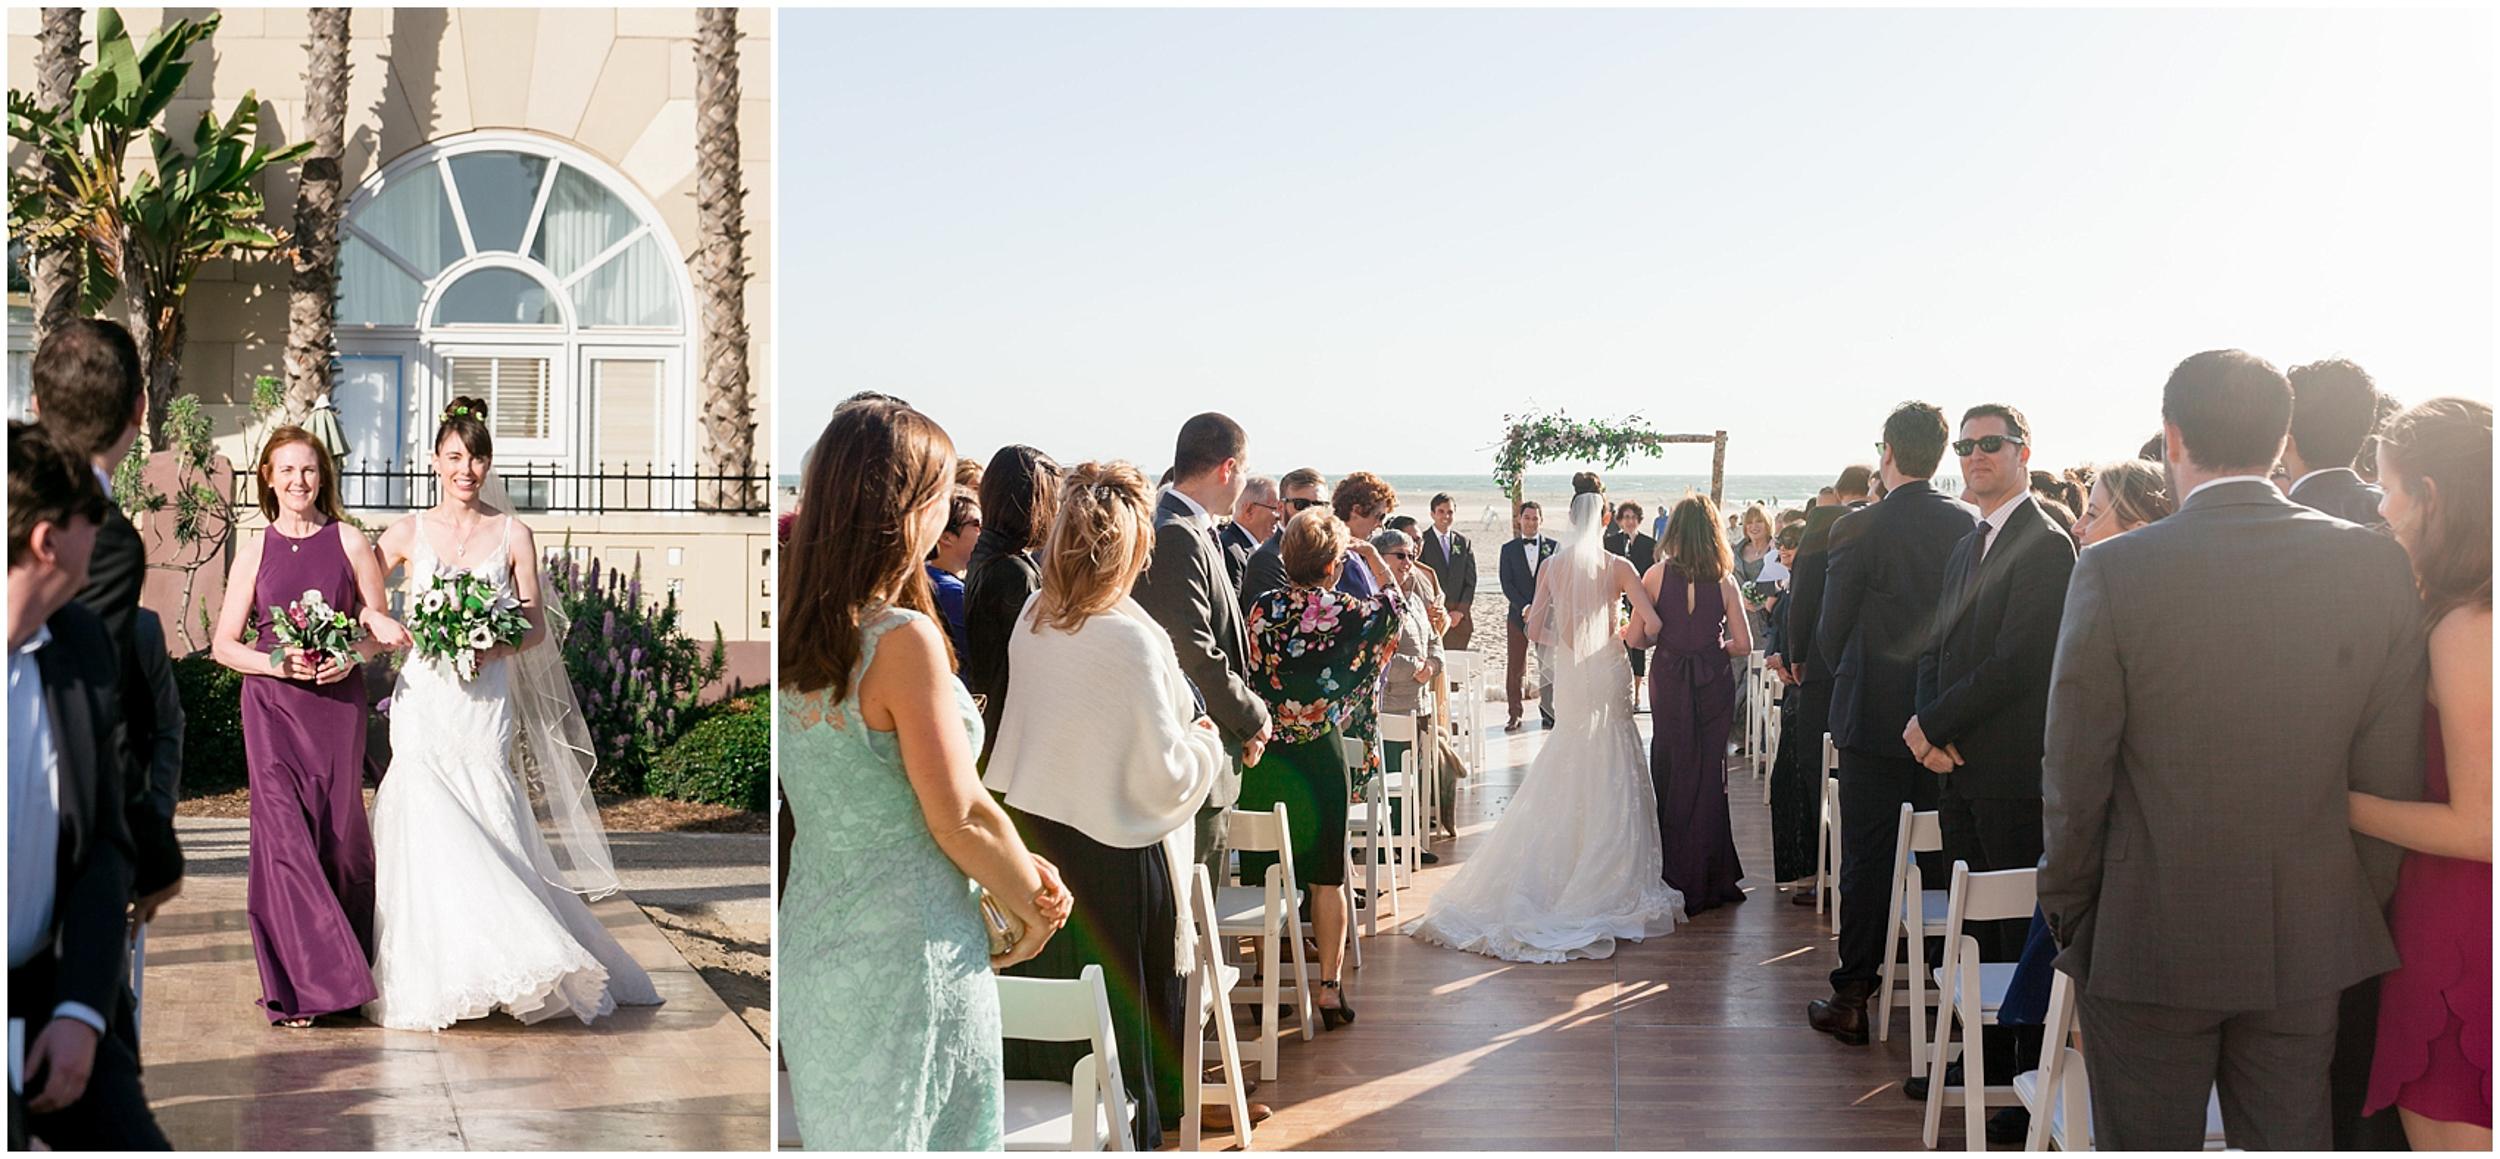 Casa Del Mar Wedding Photography Smetona Photo-0038.jpg